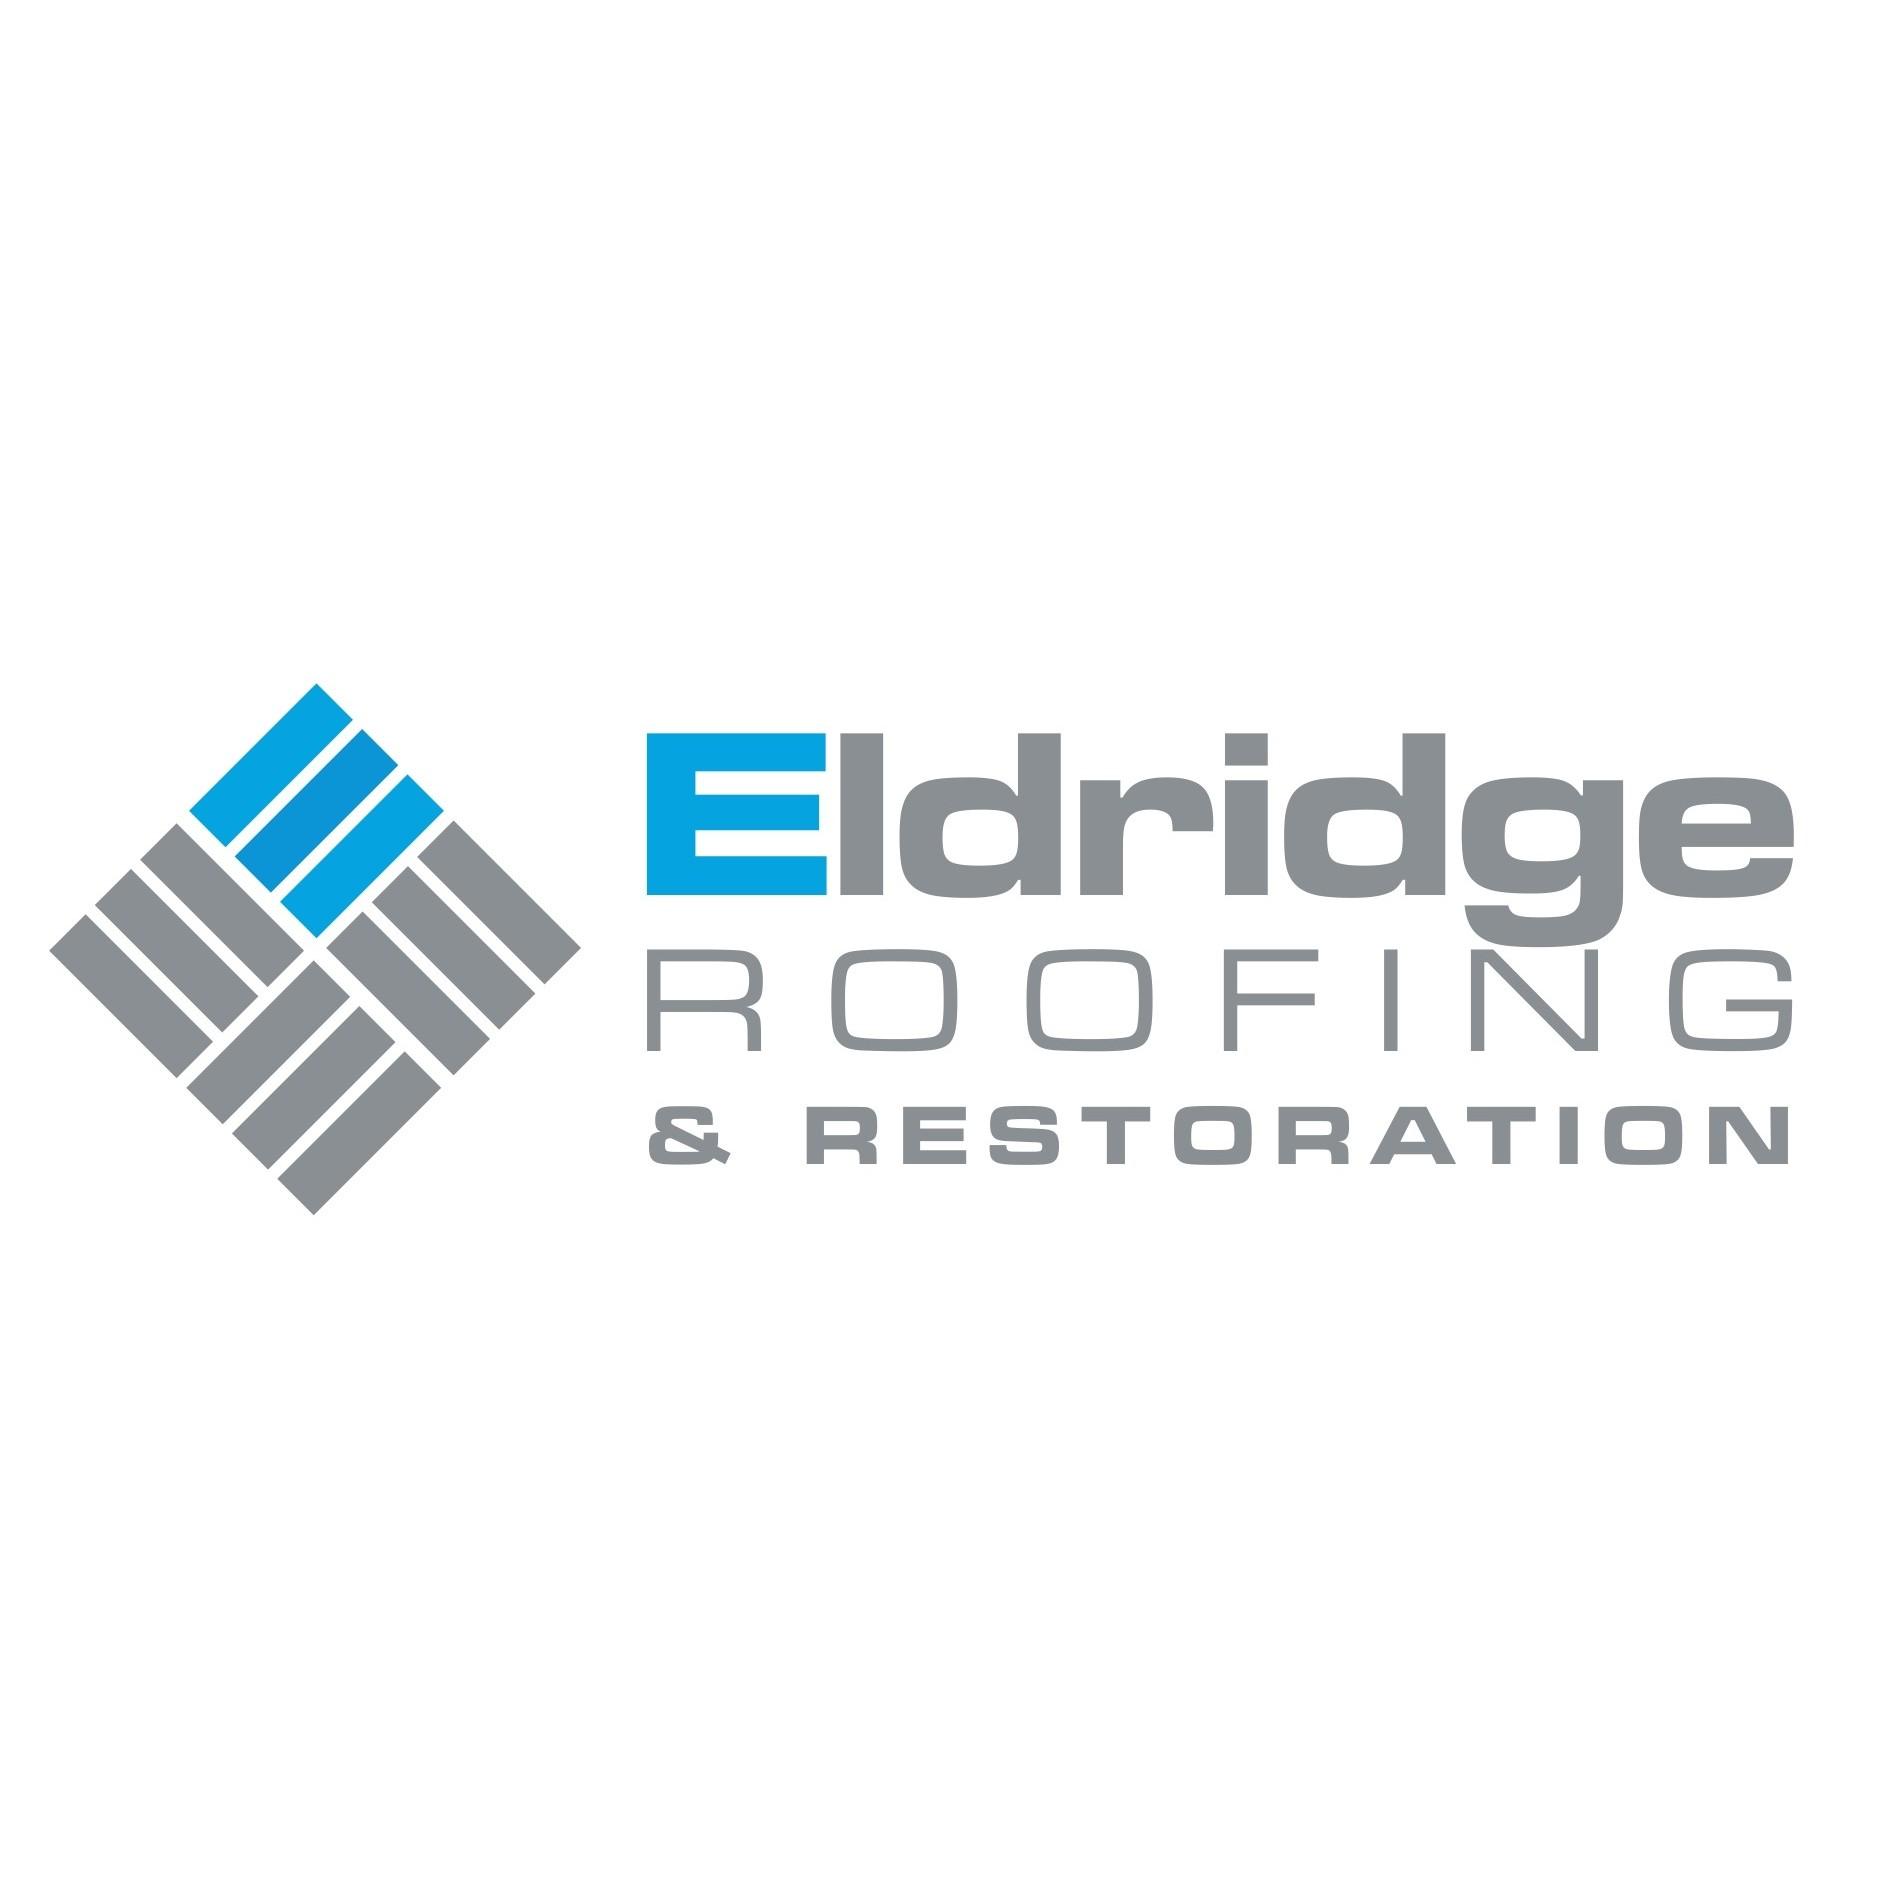 Eldridge Roofing & Restoration